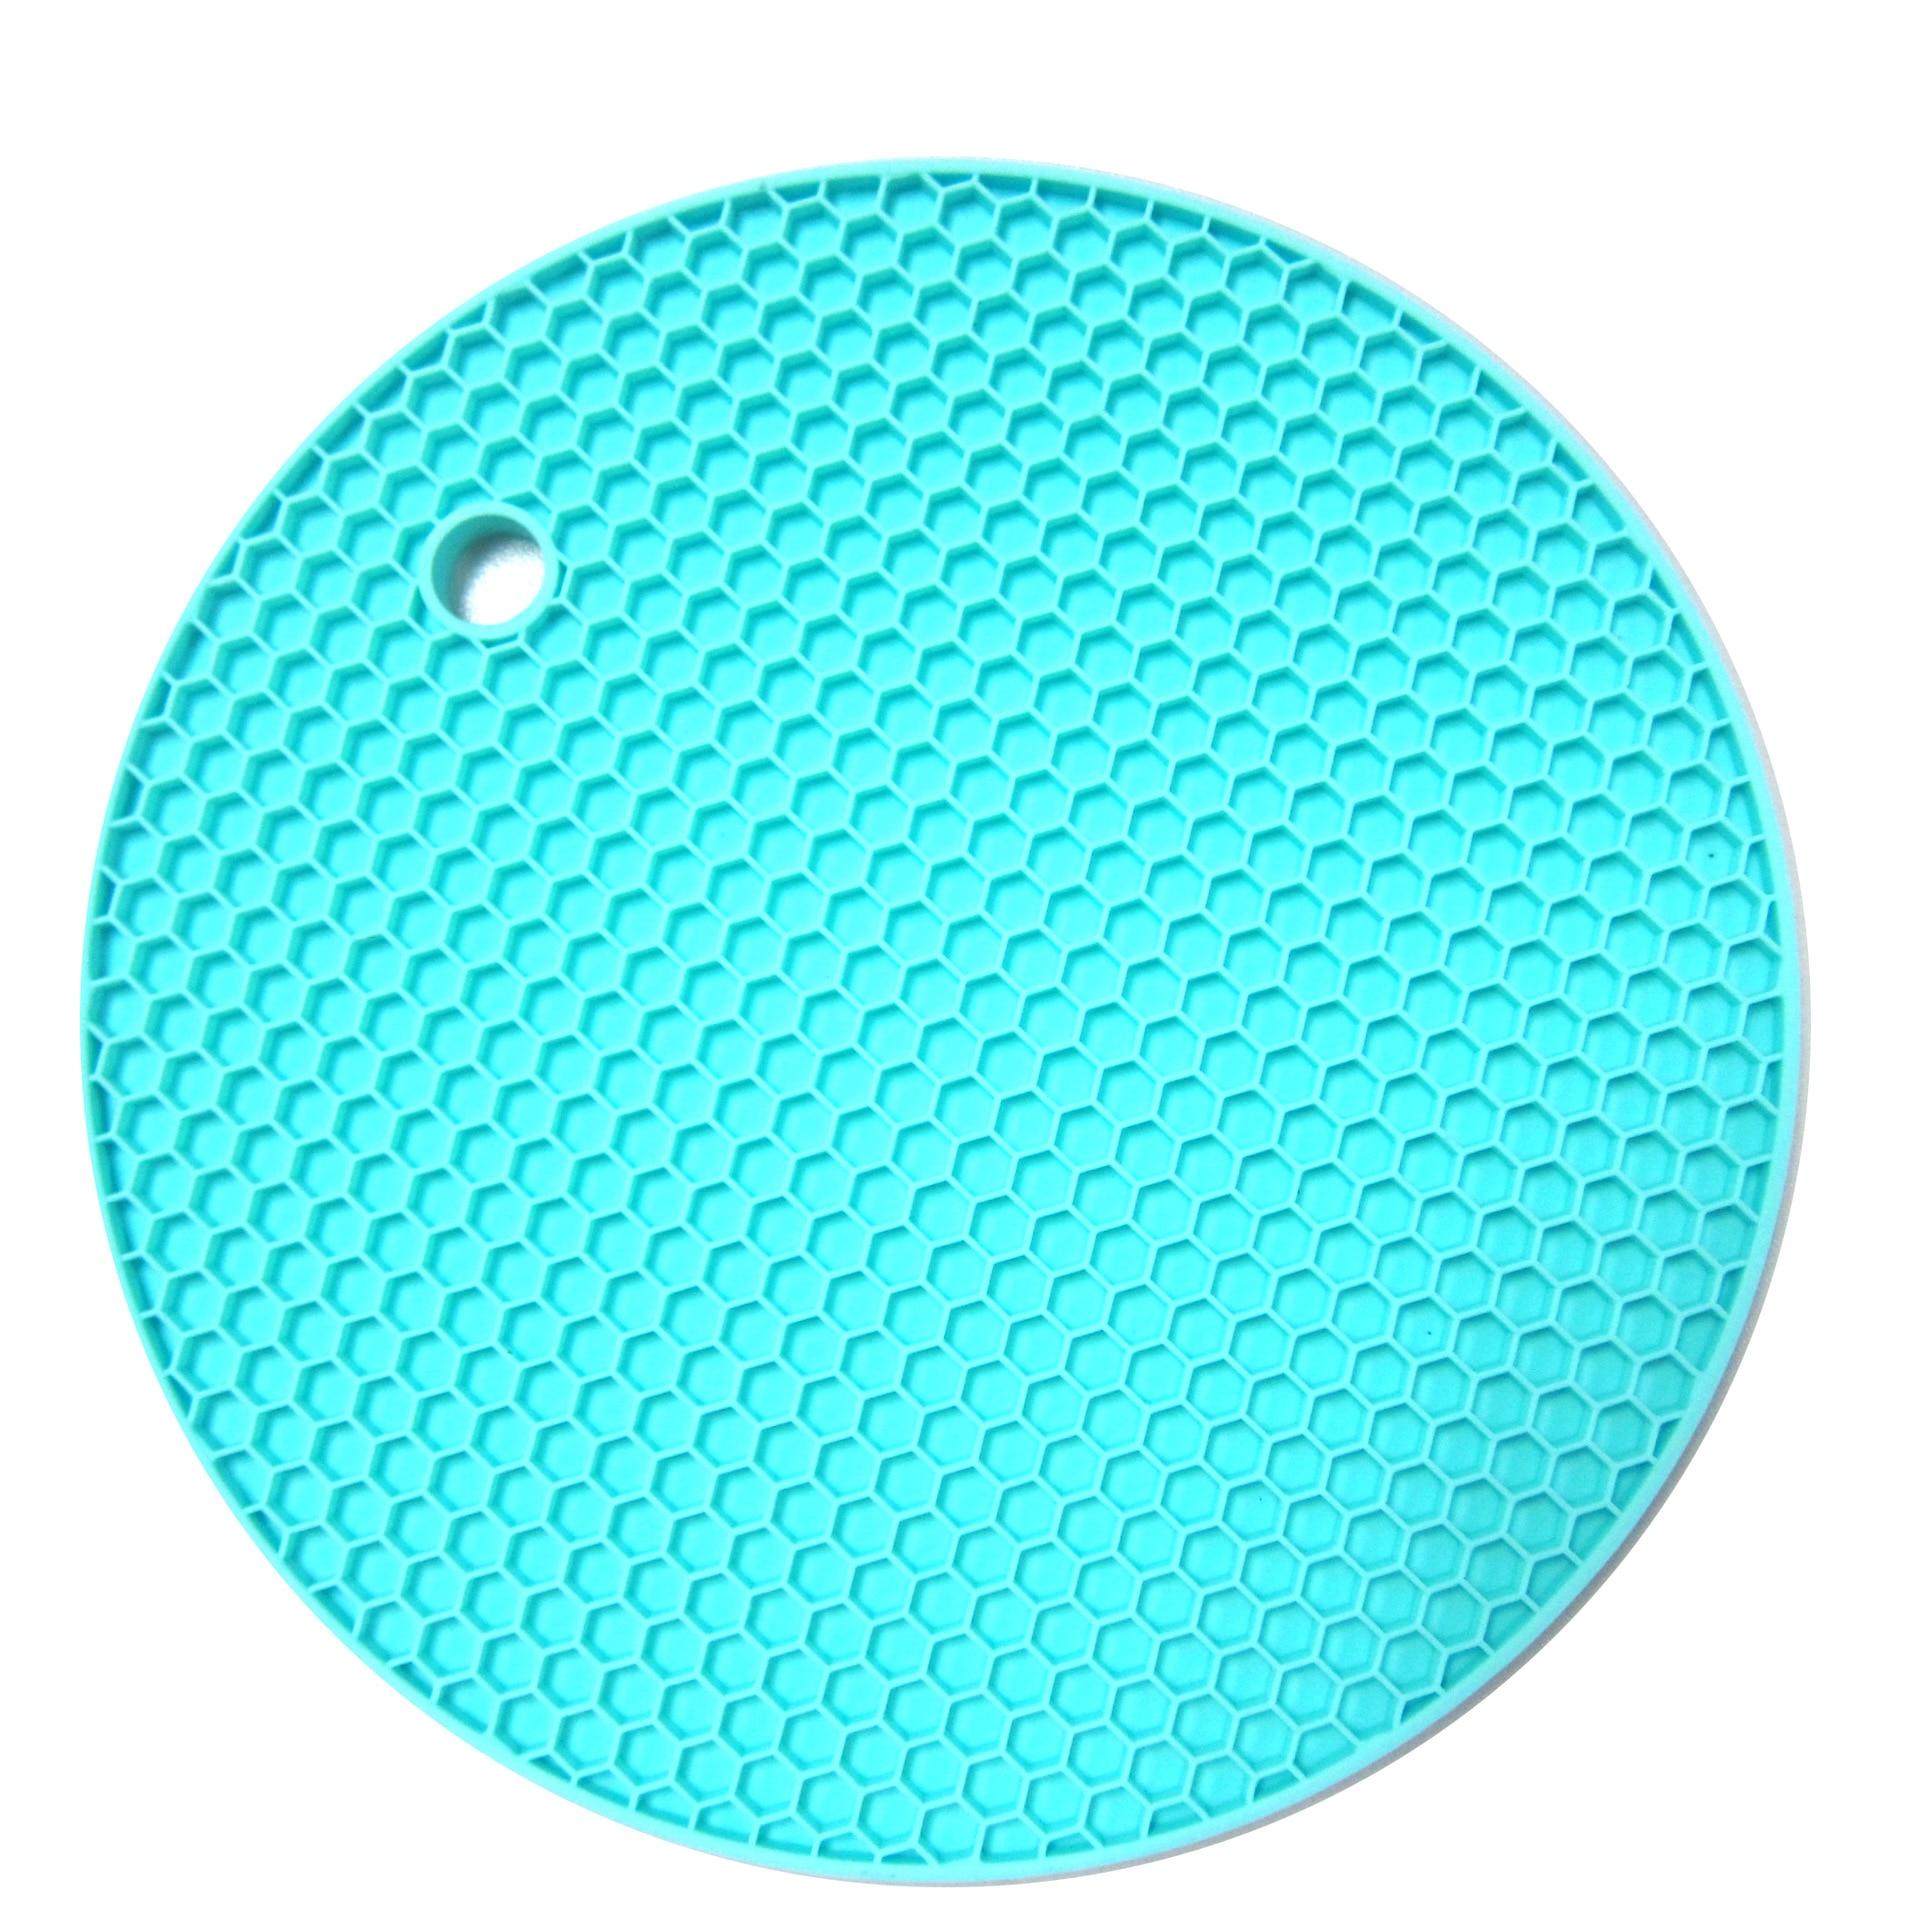 small door fold print large mats mat custom sublimation heat shop velvet resistant floor wm big design floormat press